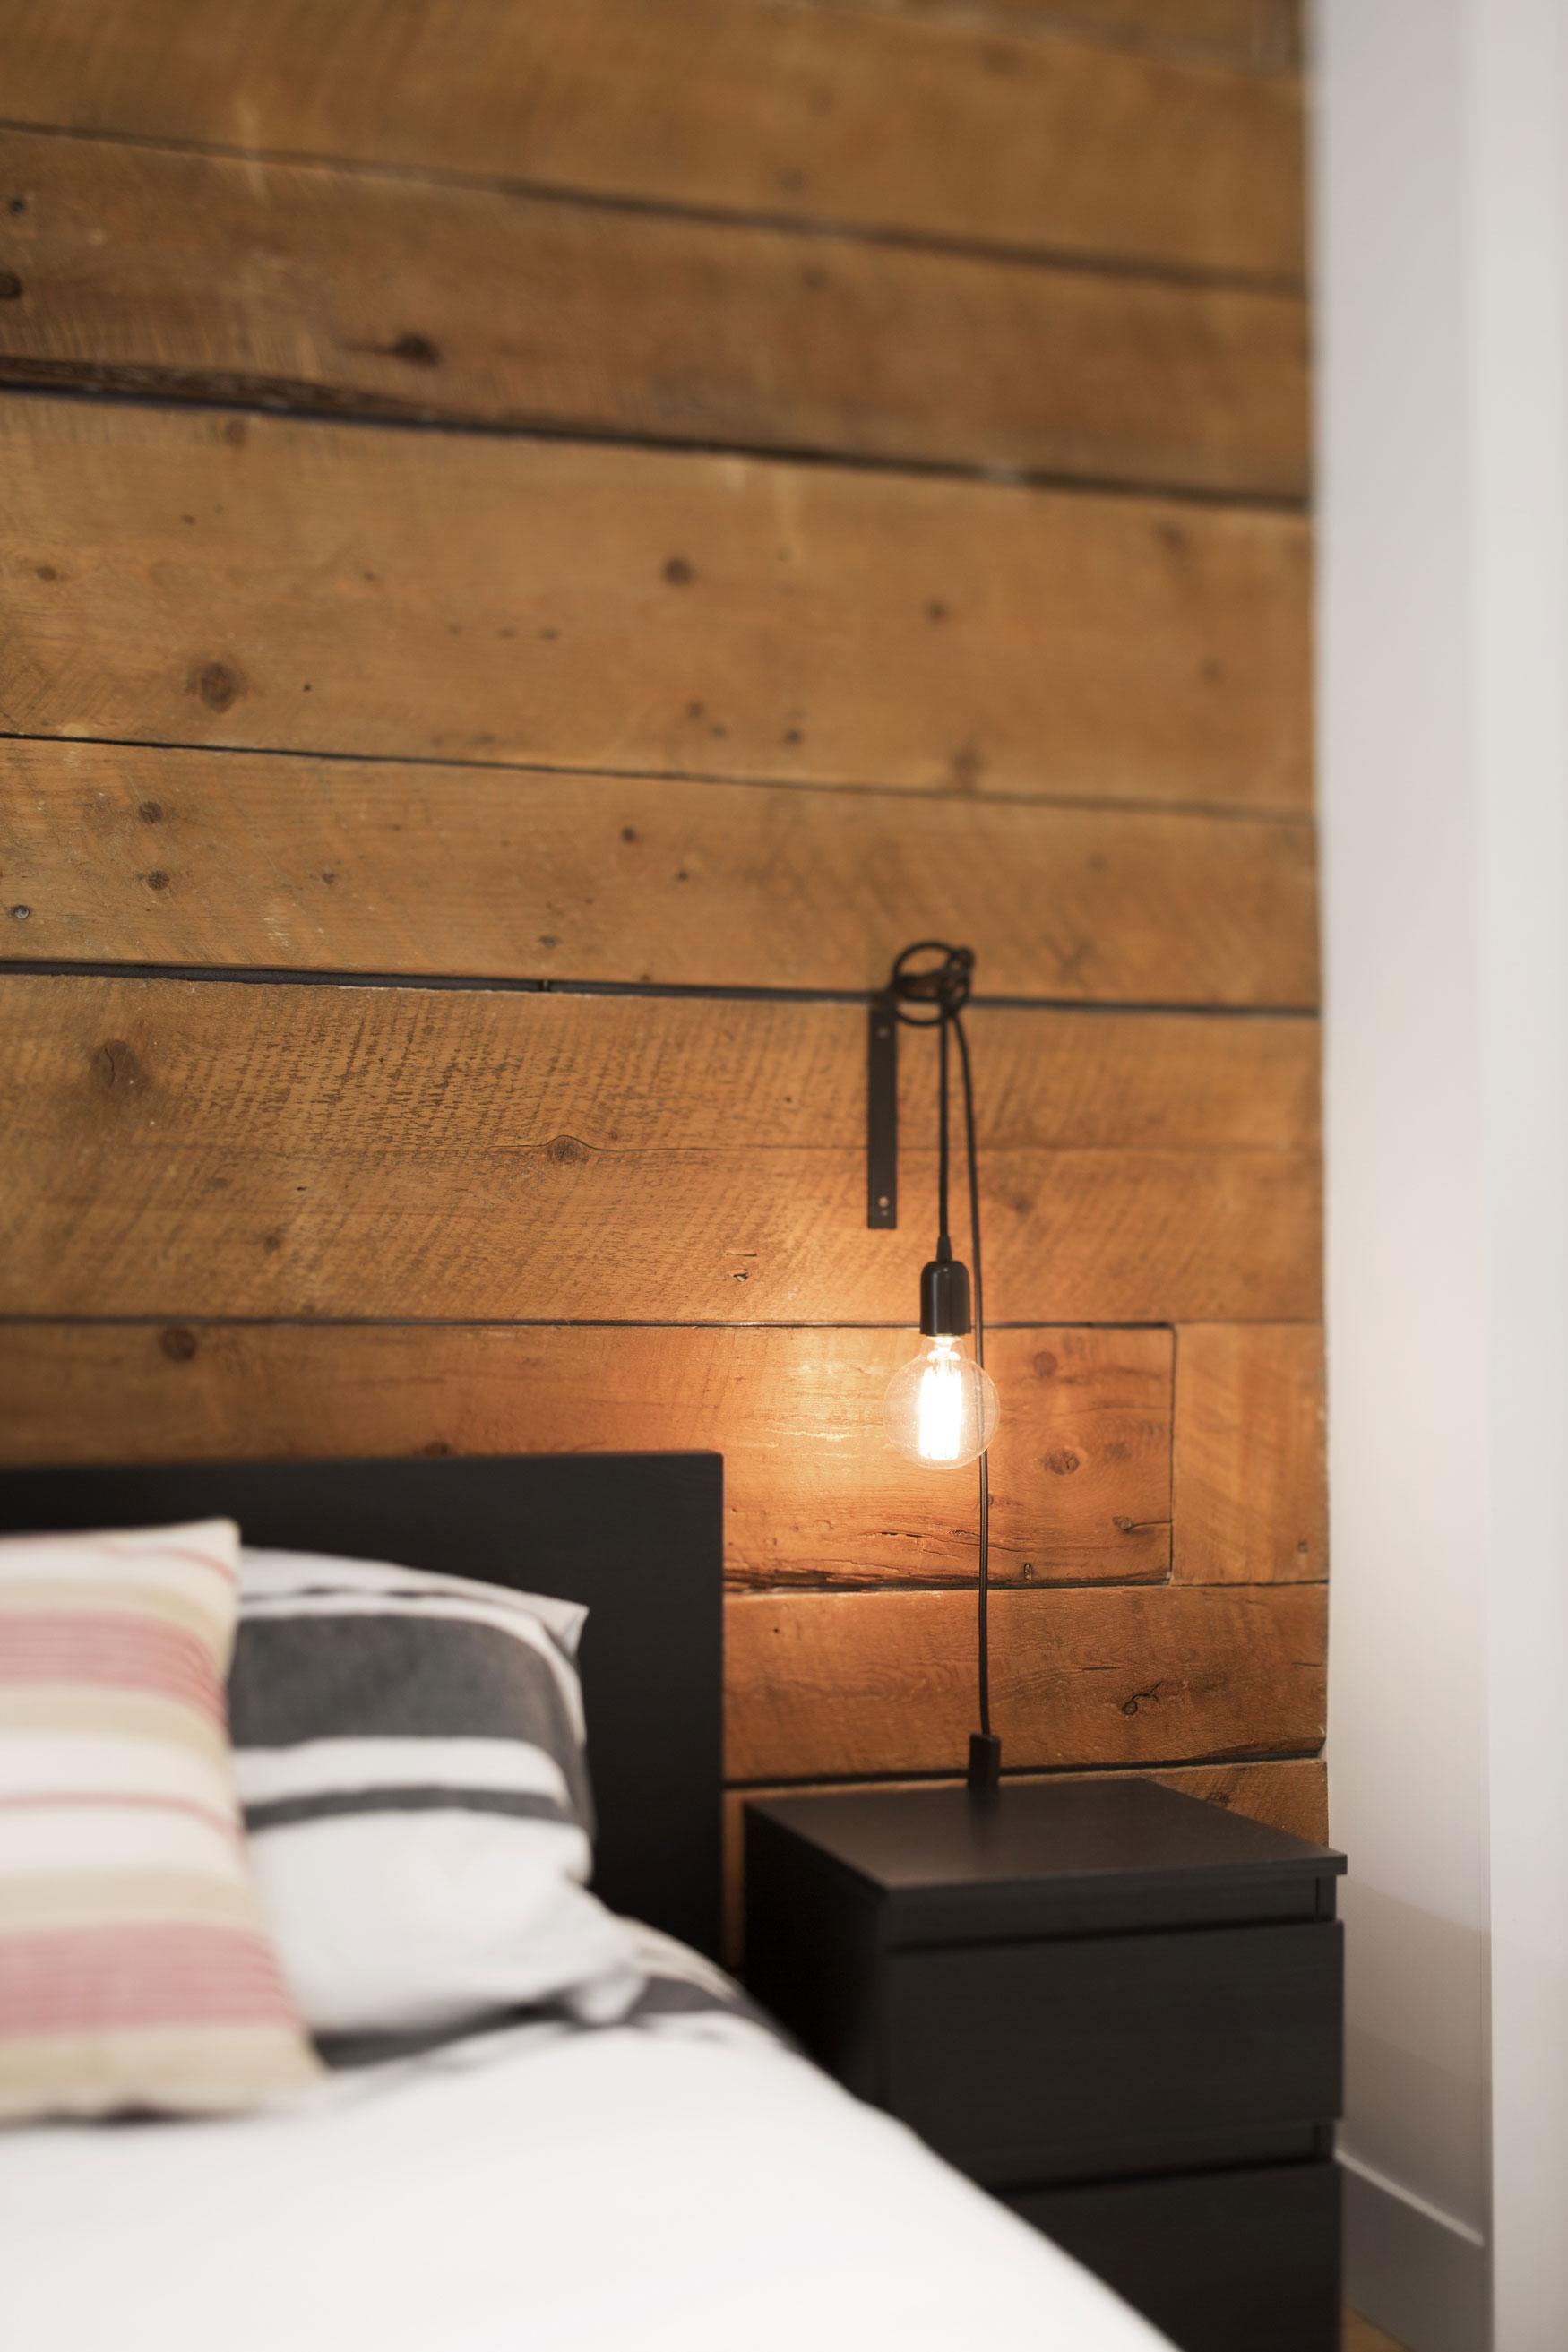 867 De Bougainville Apartment by Bourgeois:Lechasseur architects-09